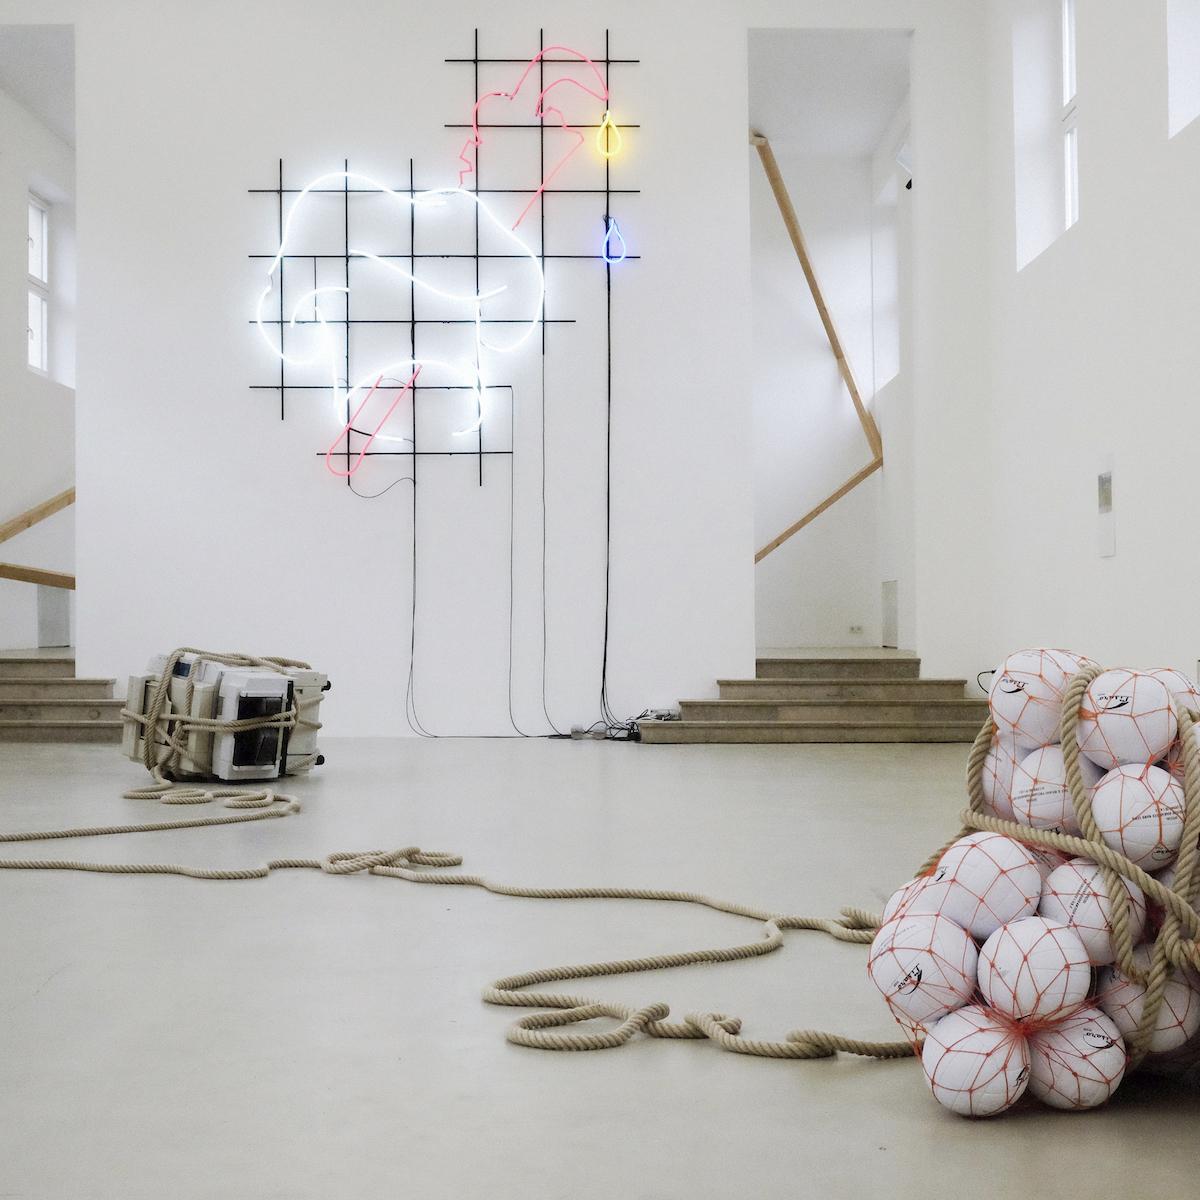 Kunst Galerie © The artists and Kunstverein München e.V.